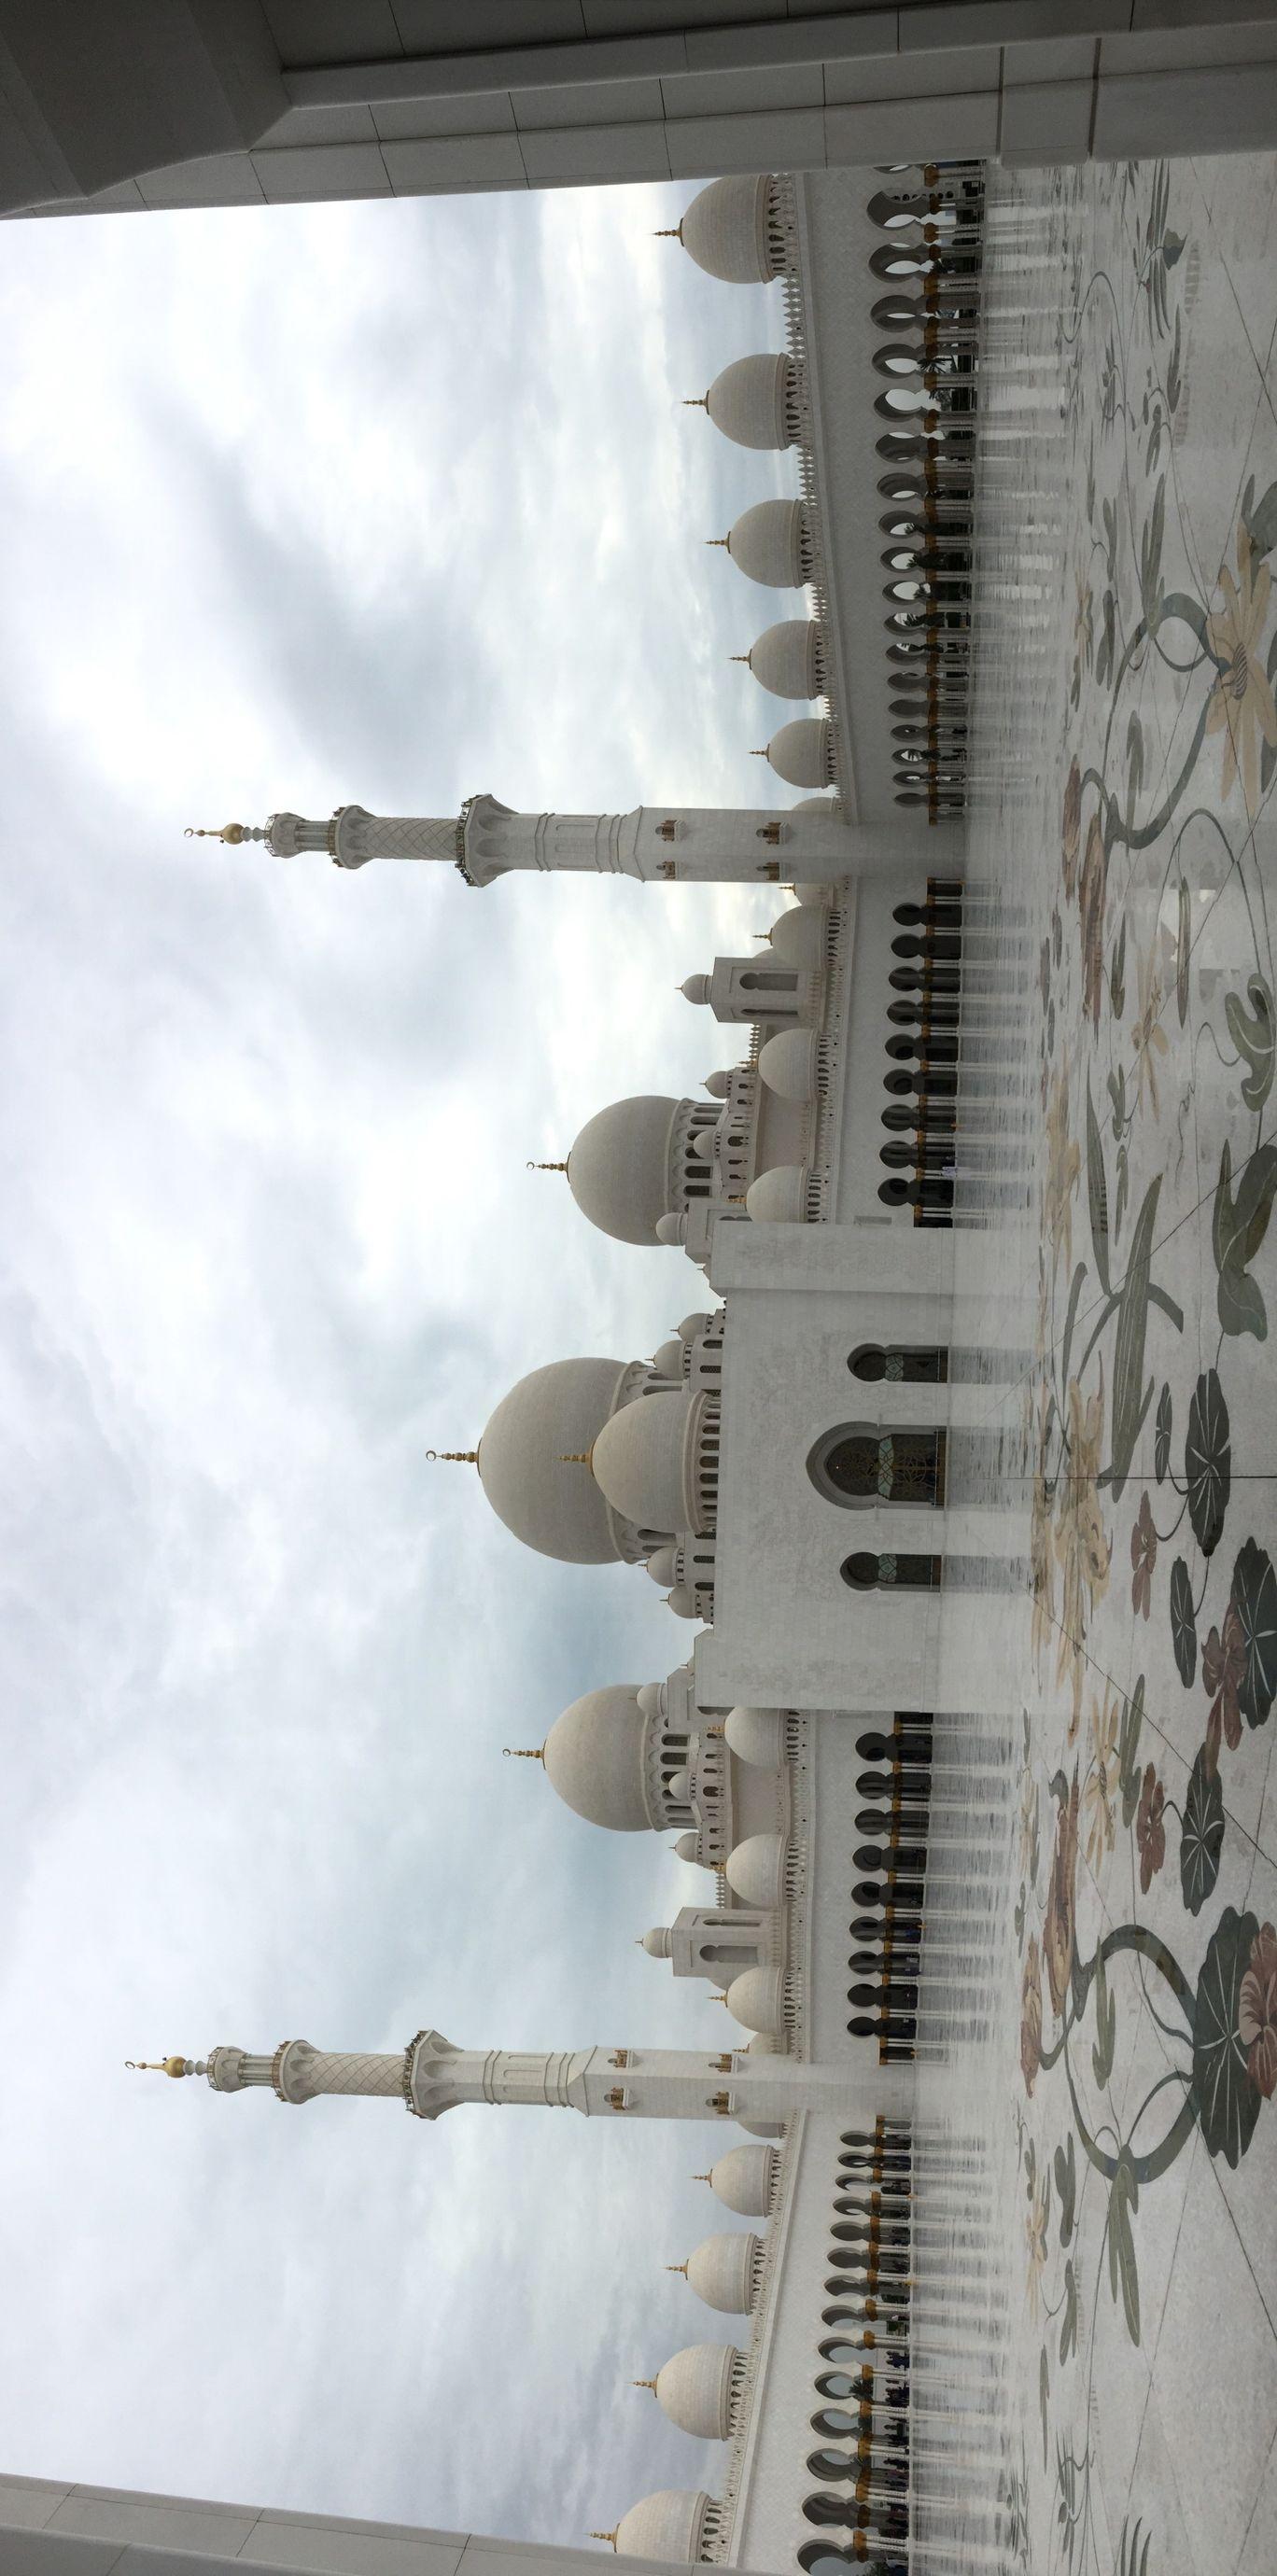 Photo of Sheikh Zayed Mosque - Abu Dhabi - United Arab Emirates By Aditya Nargotra